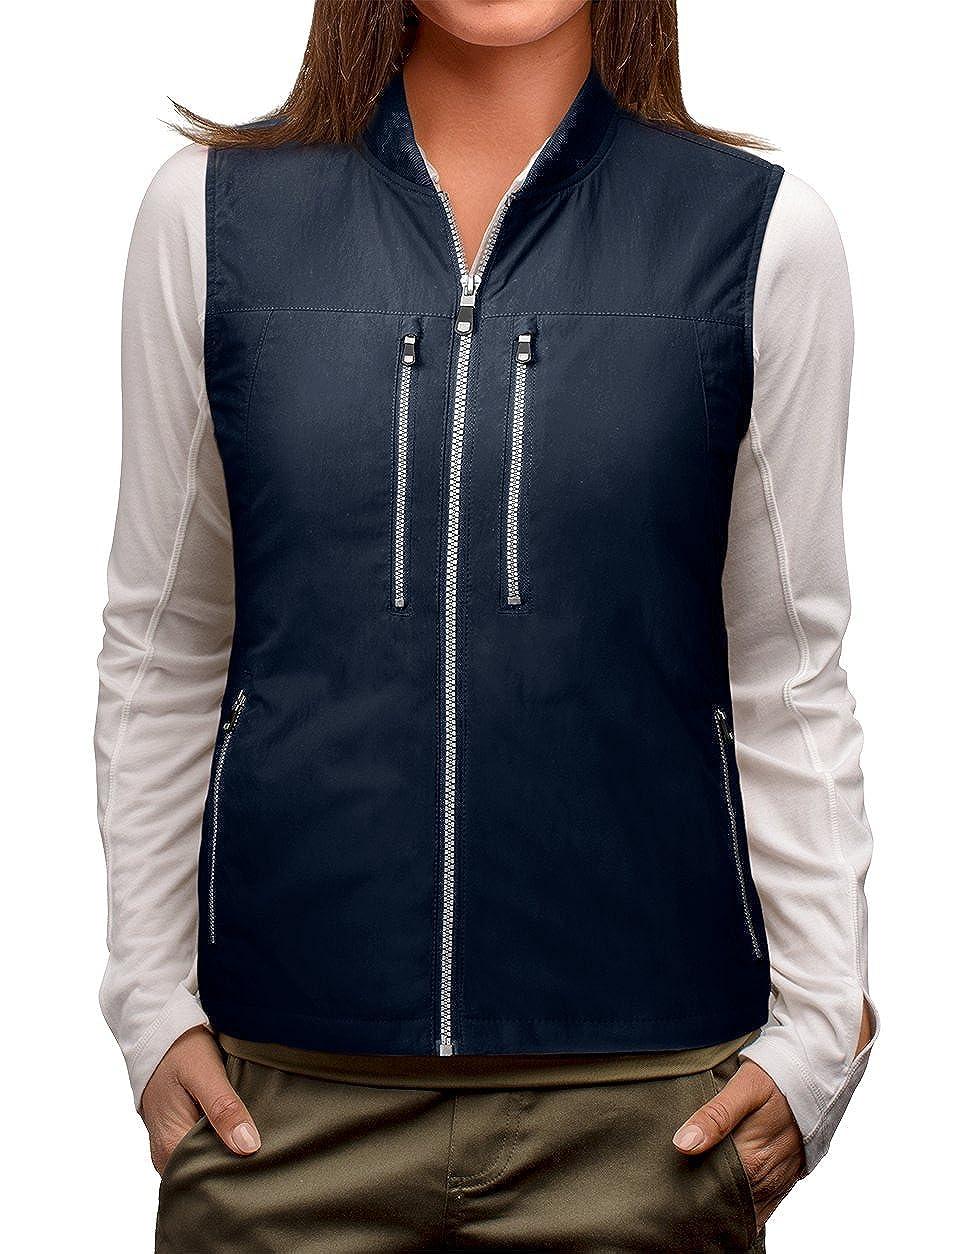 Navy SCOTTeVEST 101 Travel Vest for Women with Pockets  Lightweight Utility Vest